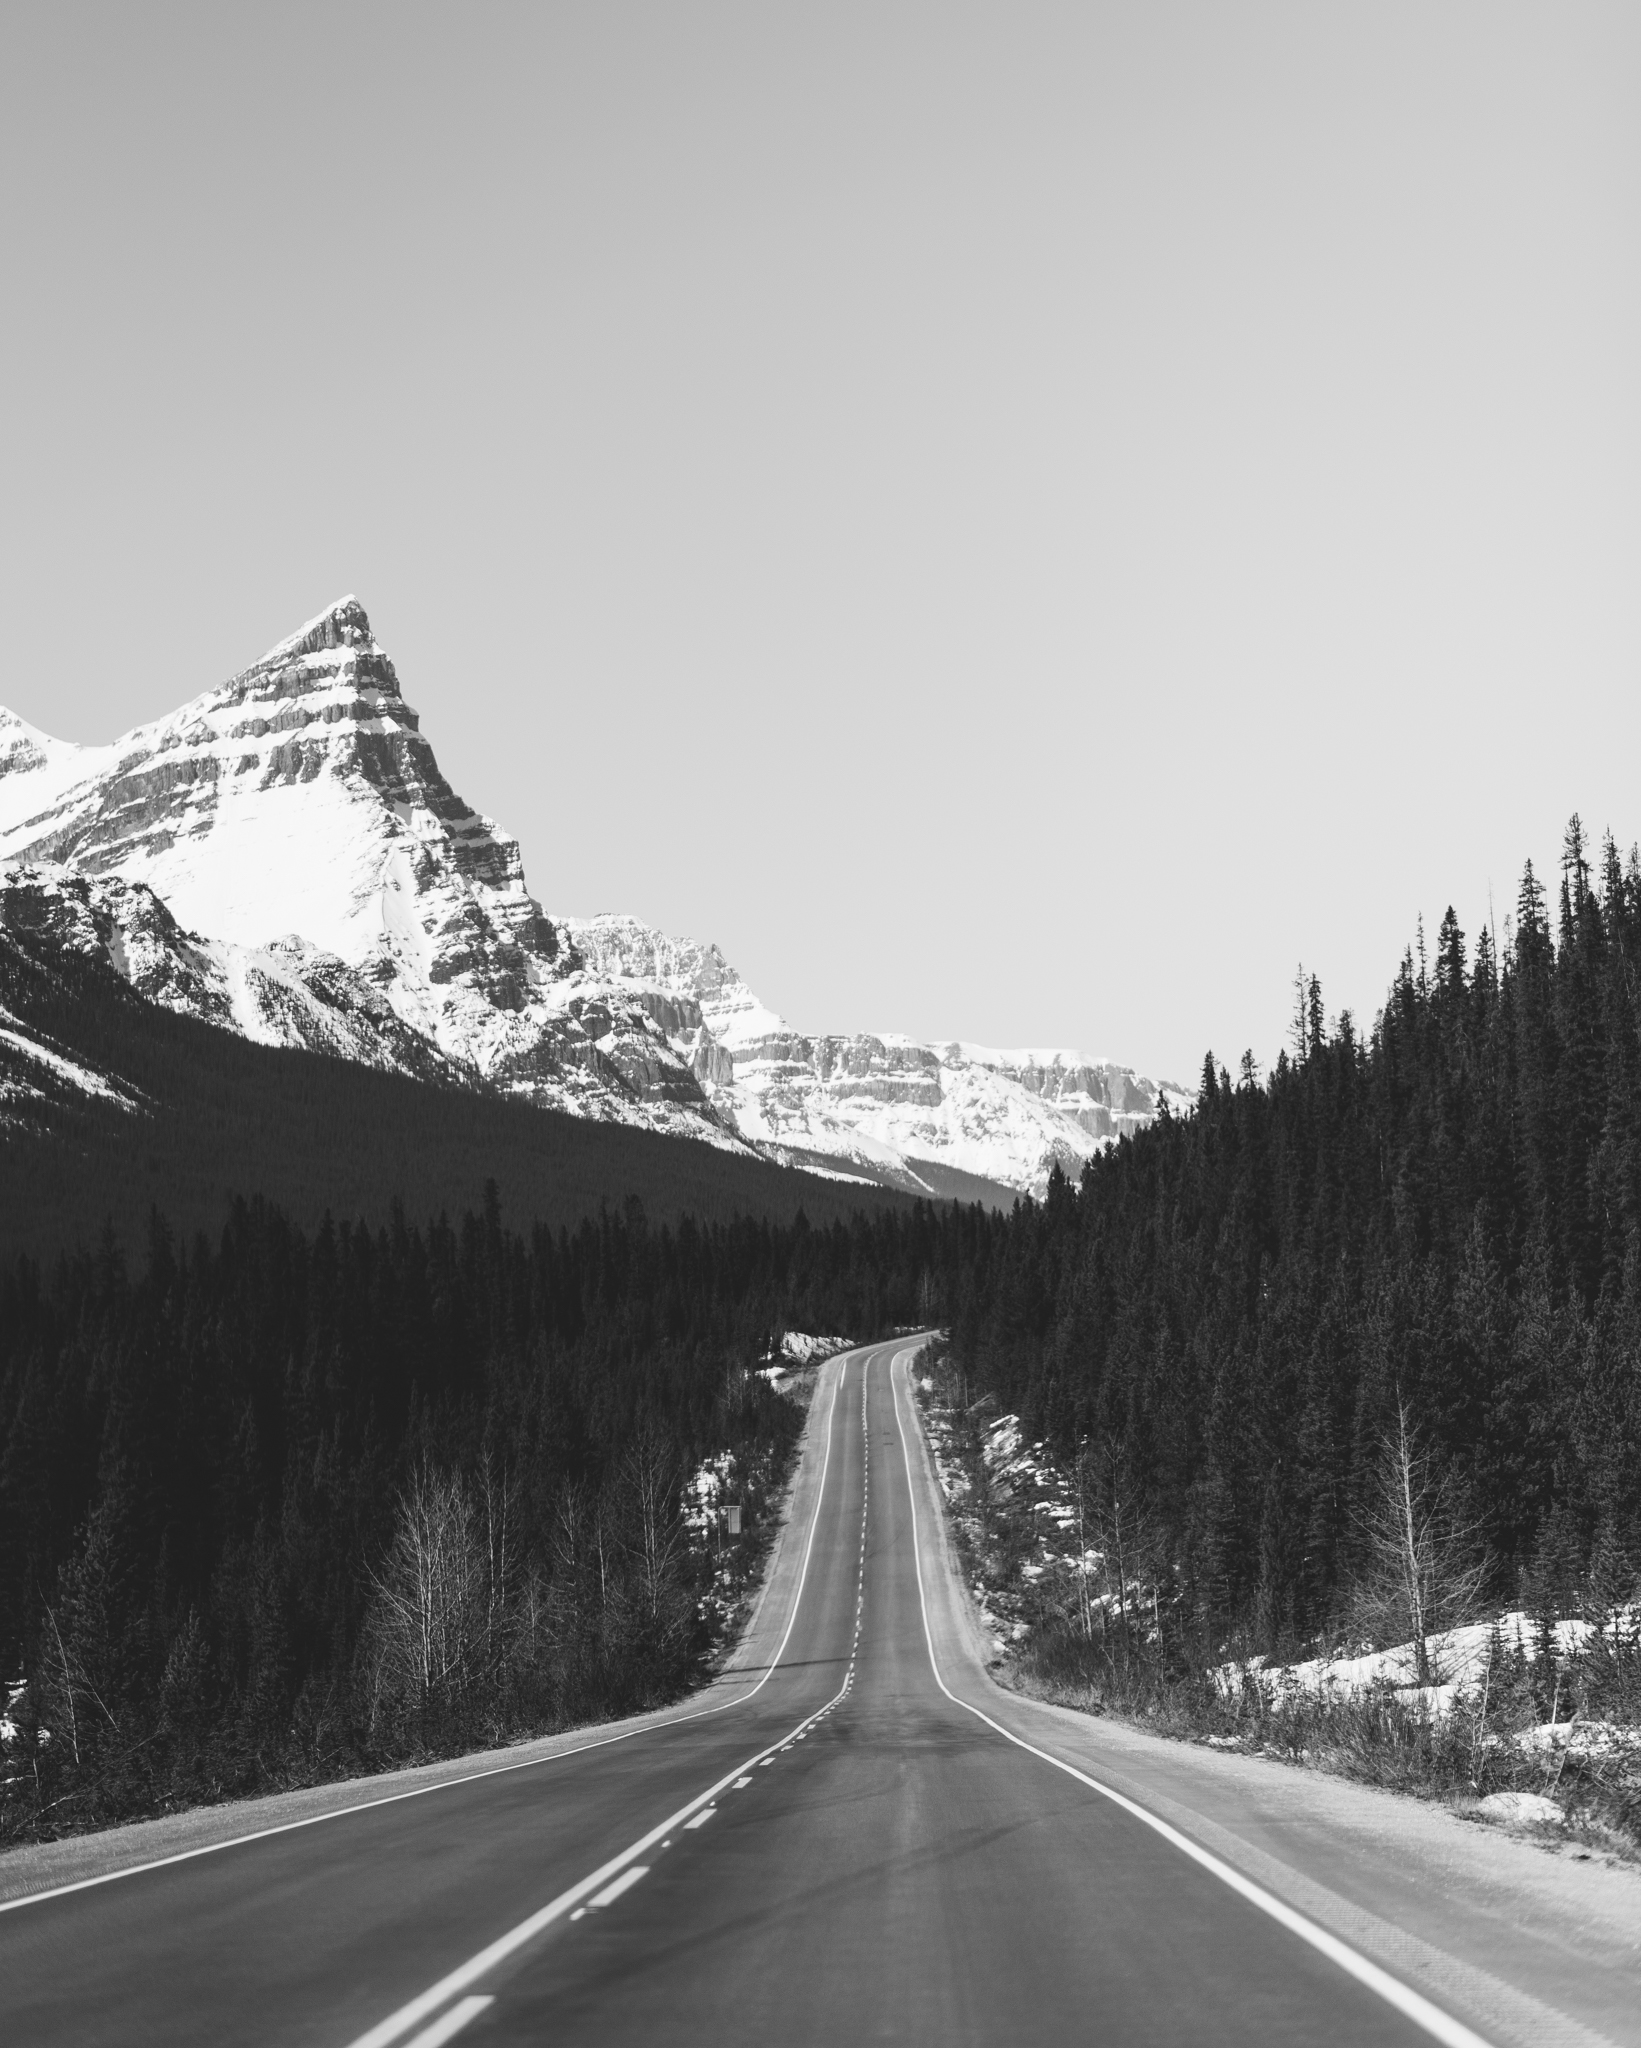 ©The-Ryans-Photo---Athabasca-Glacier,-Ice-Cave-008.jpg